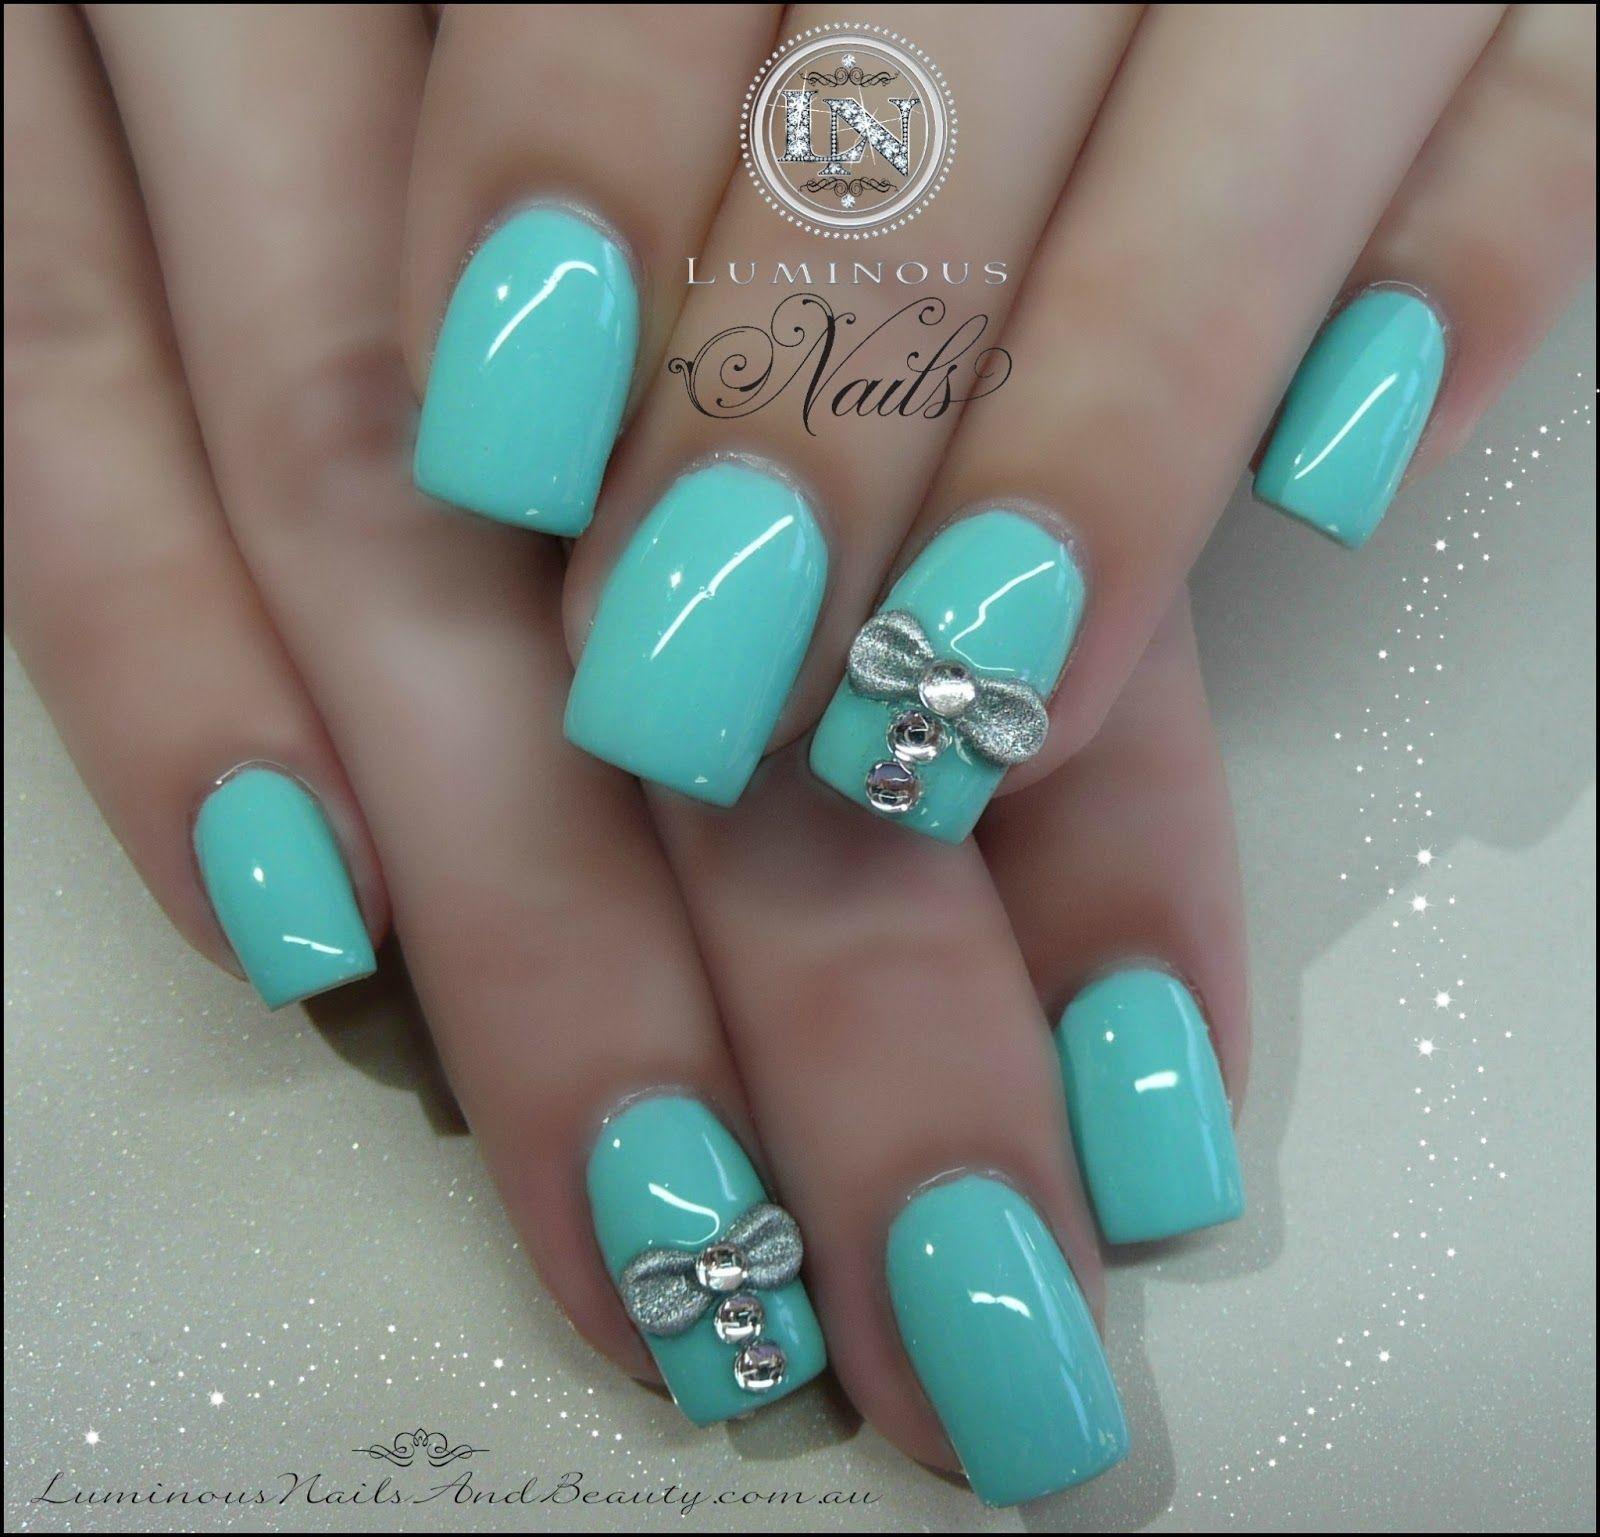 Luminous nails beauty gold coast queensland acrylic for Acrylic nails salon brisbane